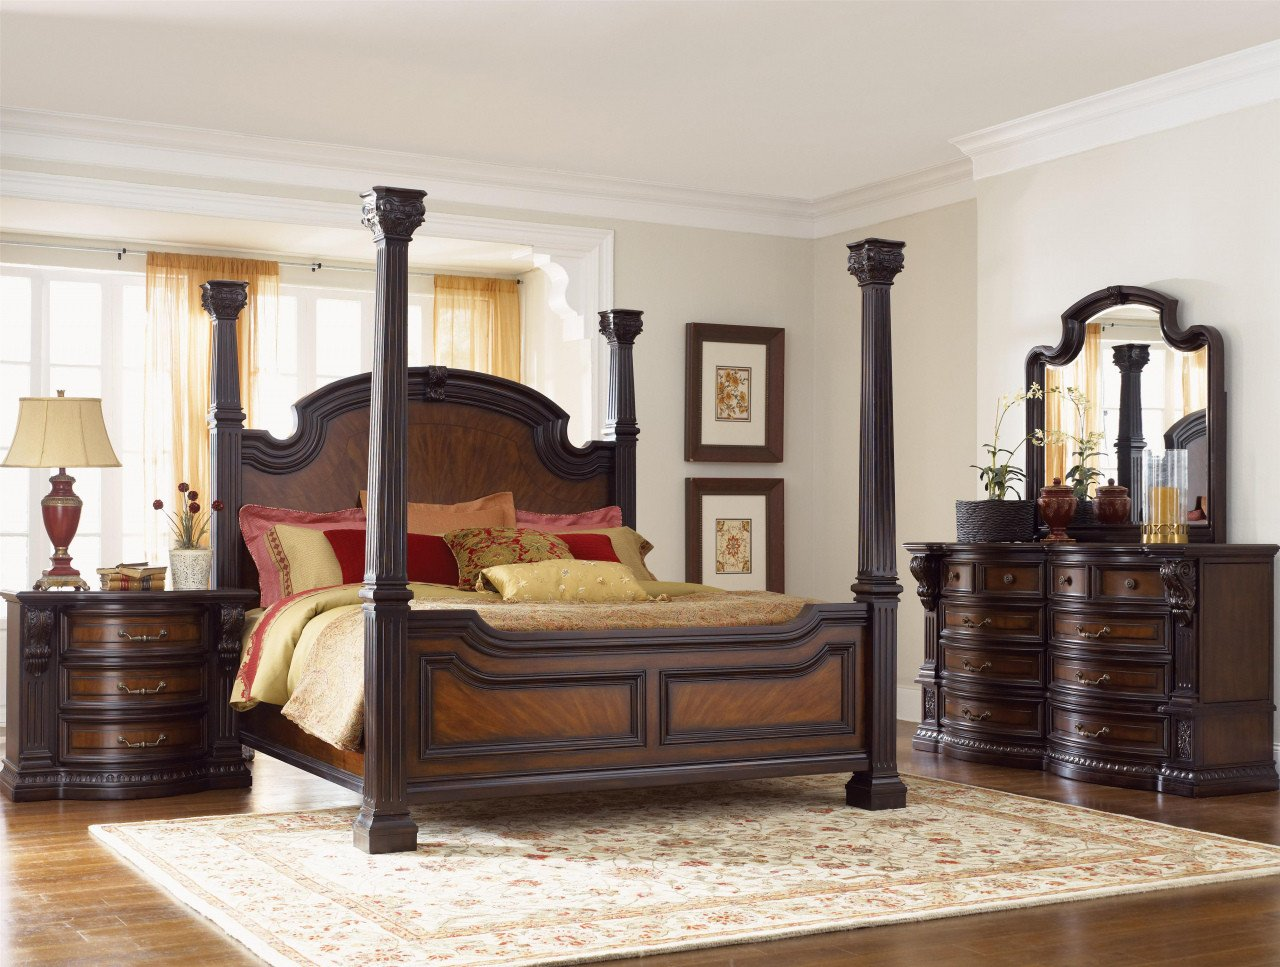 Grand Furniture Bedroom Set Unique Cal King Bedroom Sets — Procura Home Blog